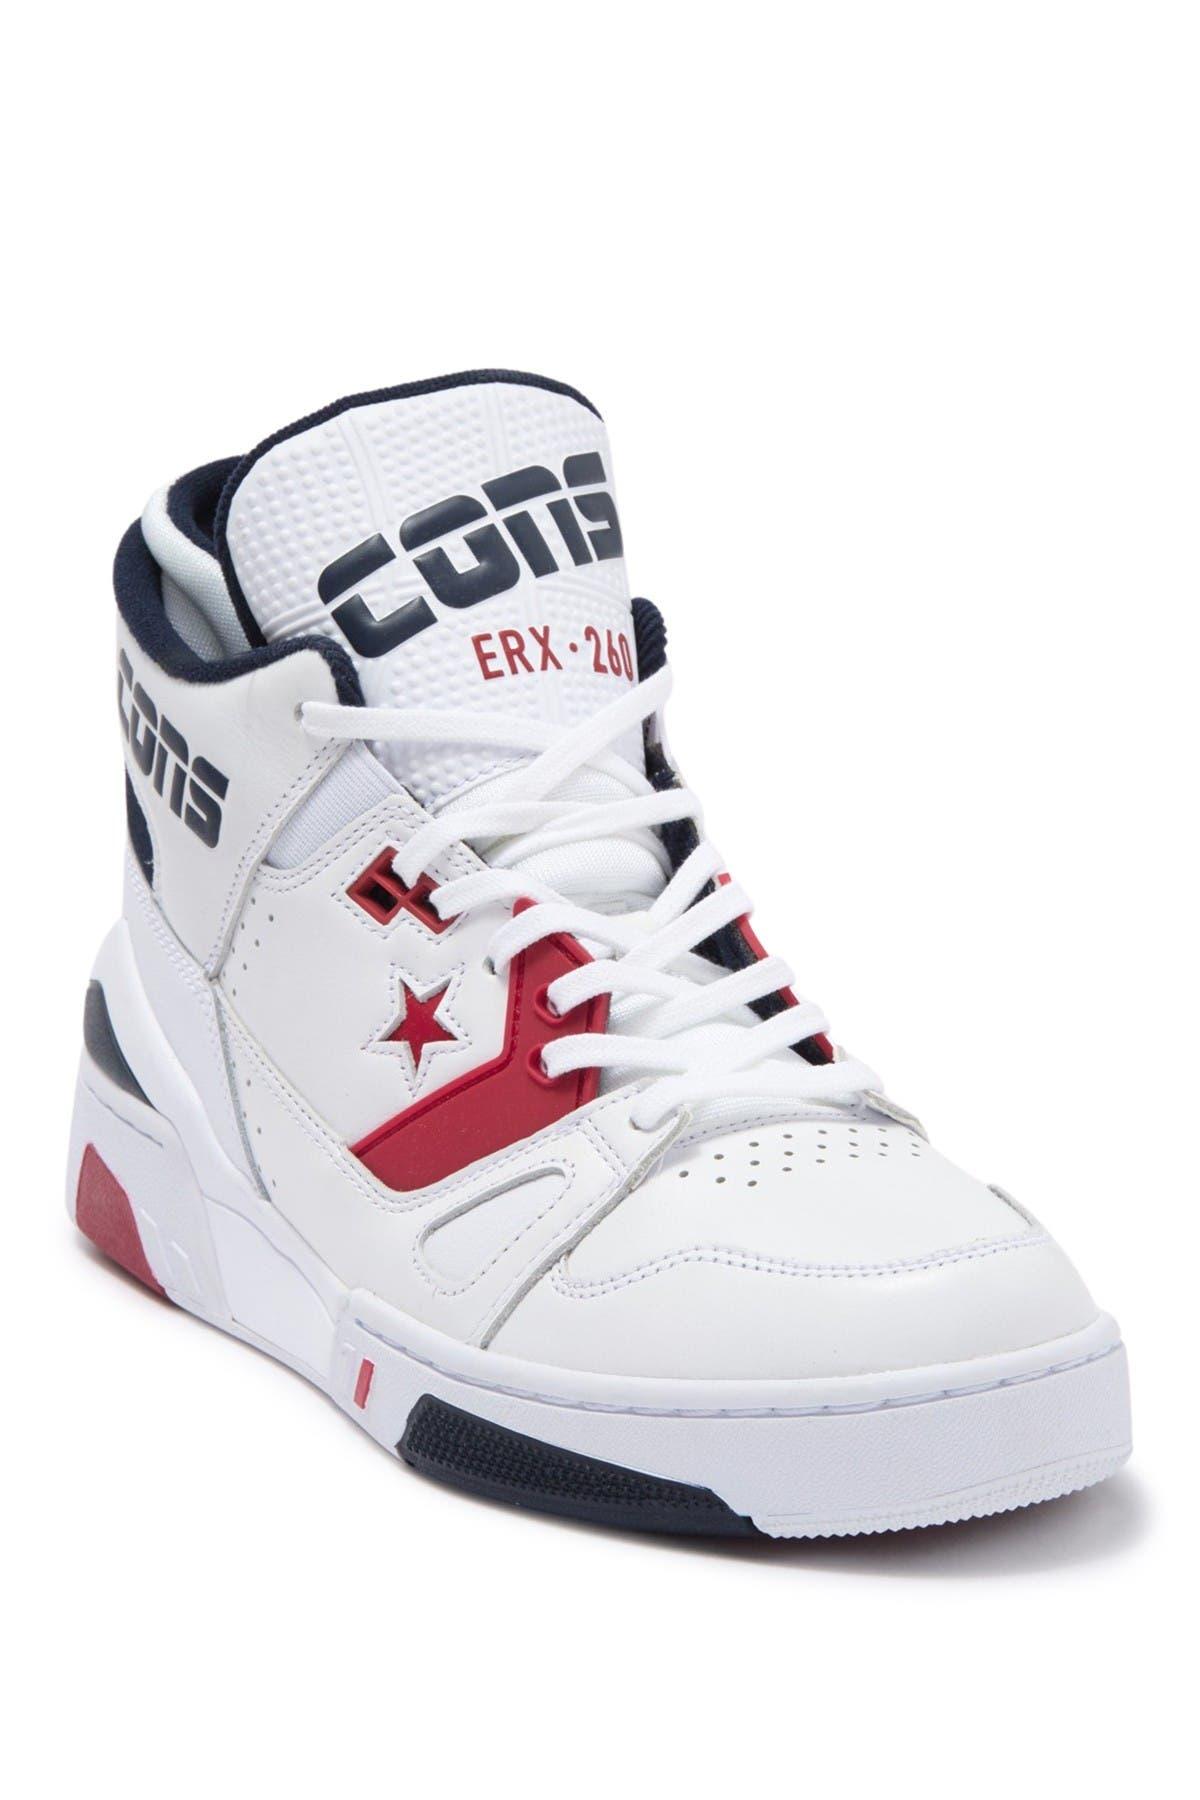 Converse   ERX 260 High Top Sneaker